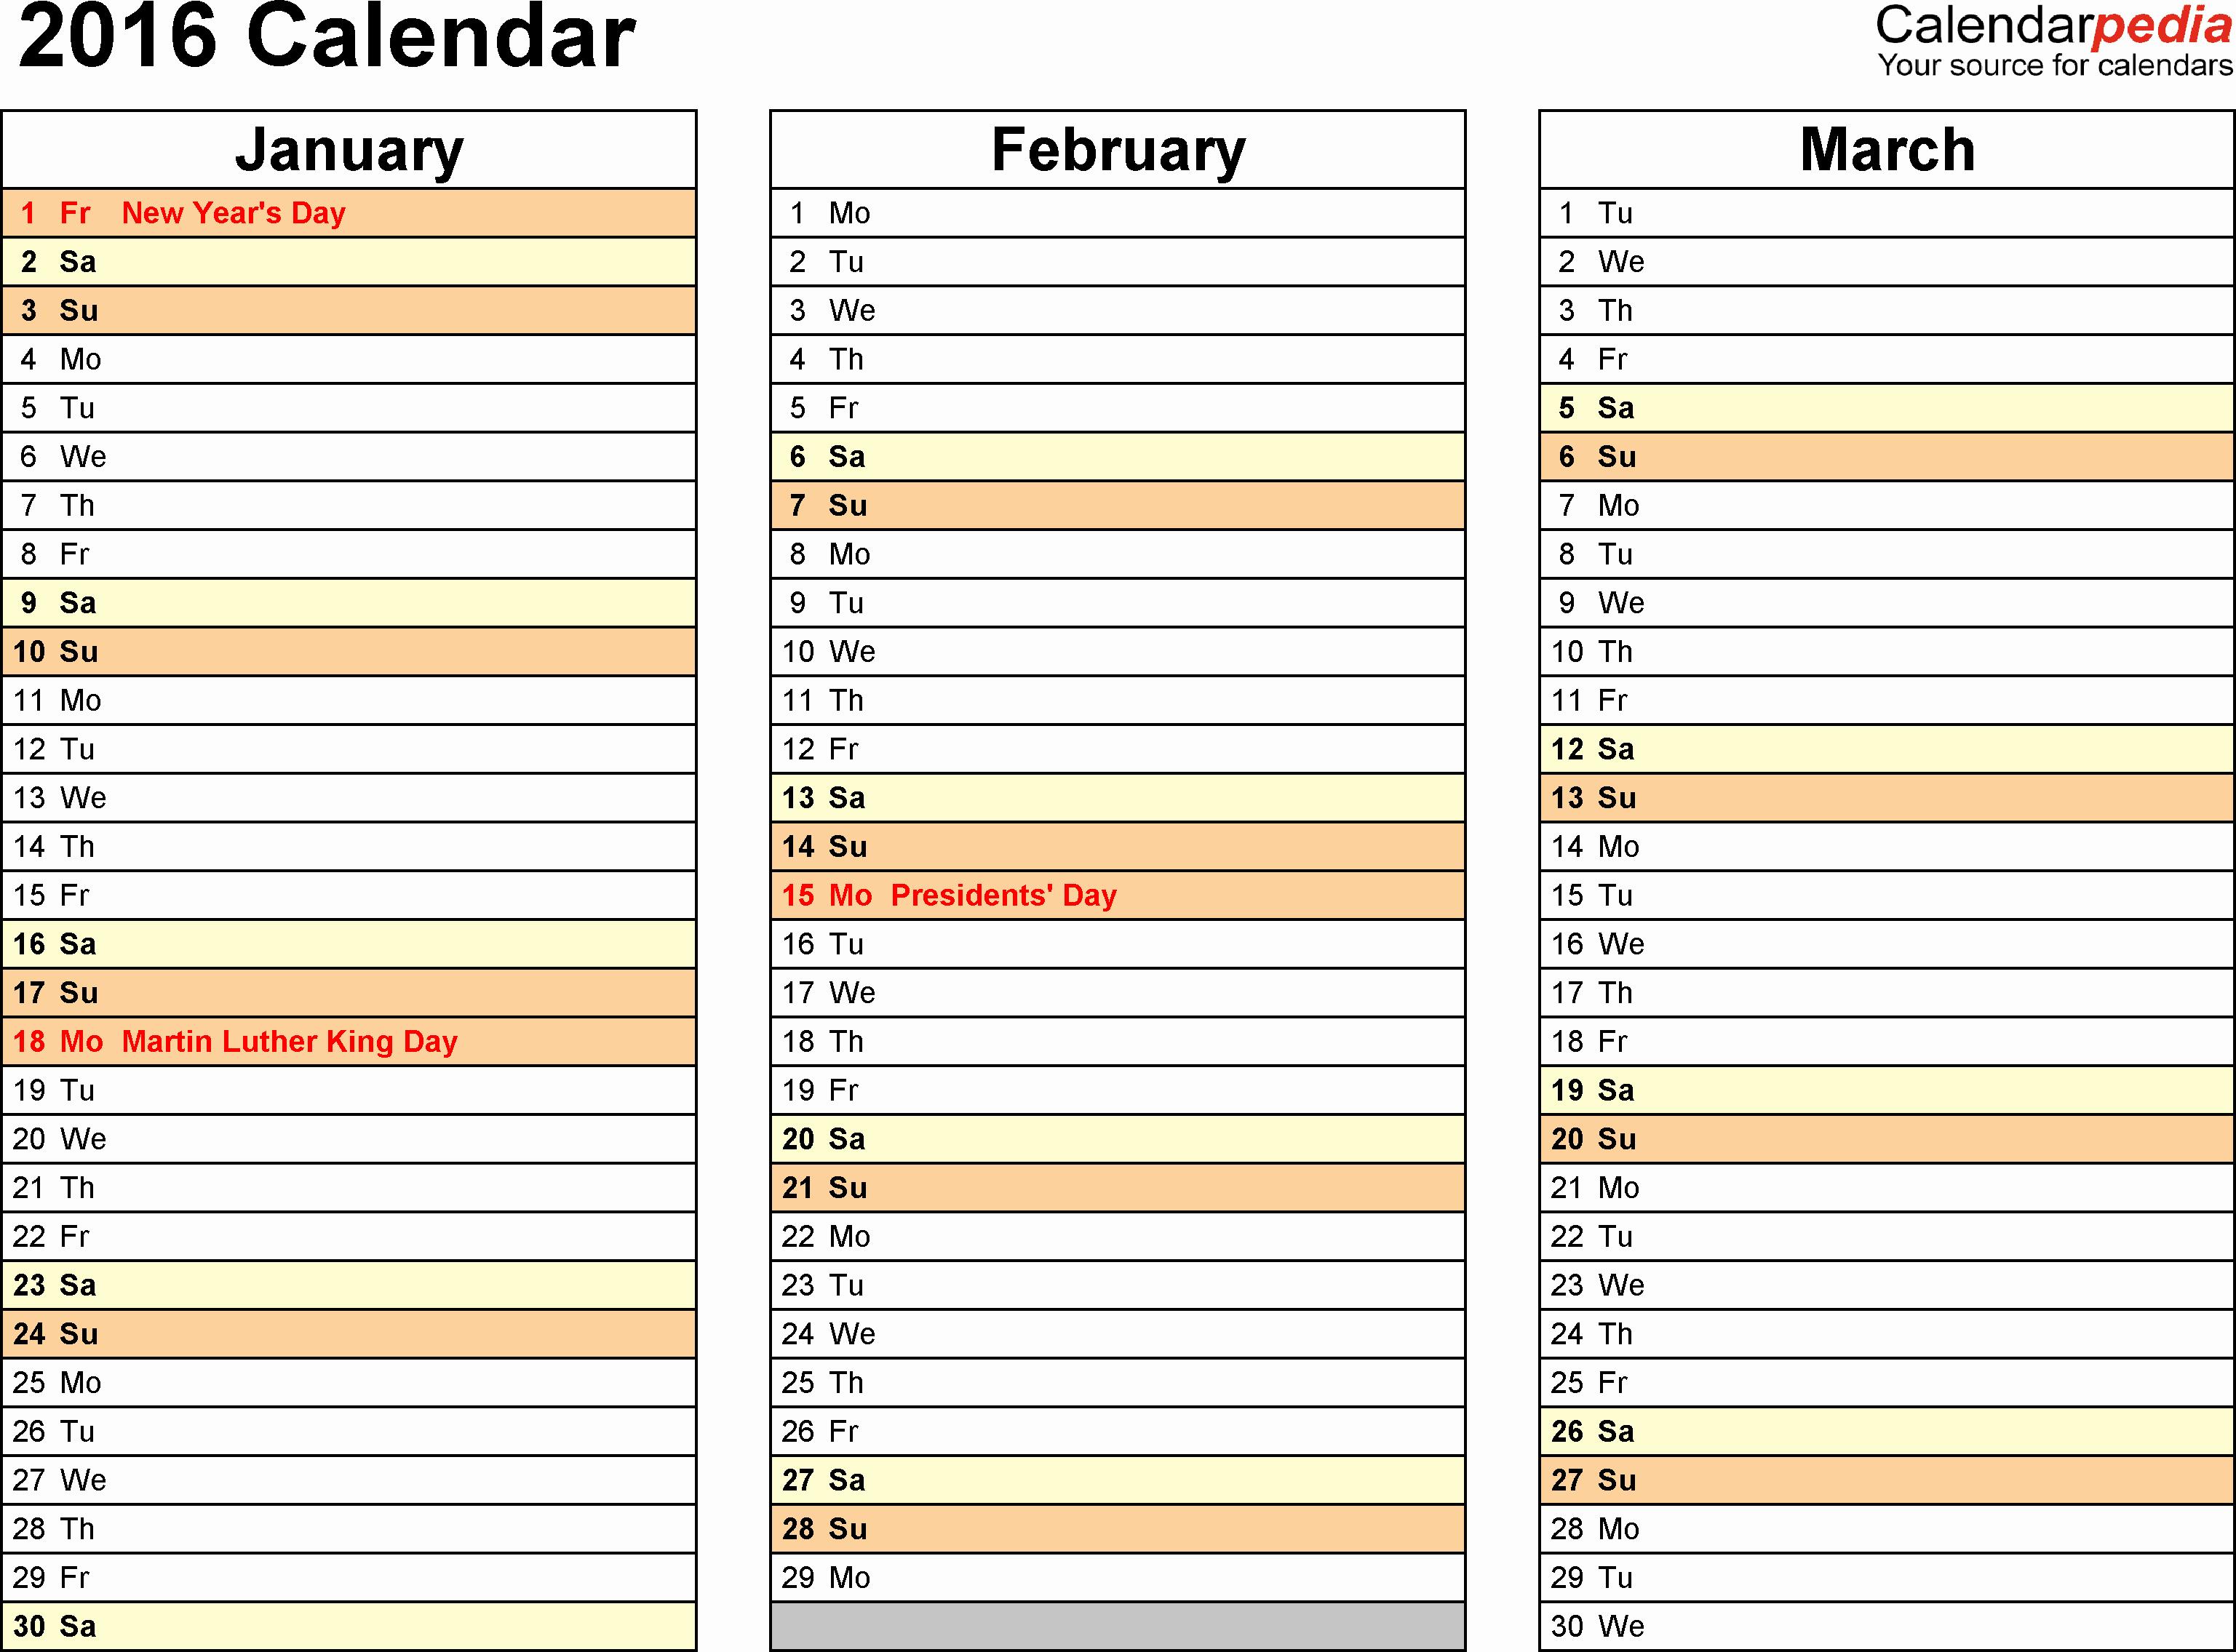 3 Month Calendar 2016 Template Fresh 2016 Printable Calendar Templates 3 Month